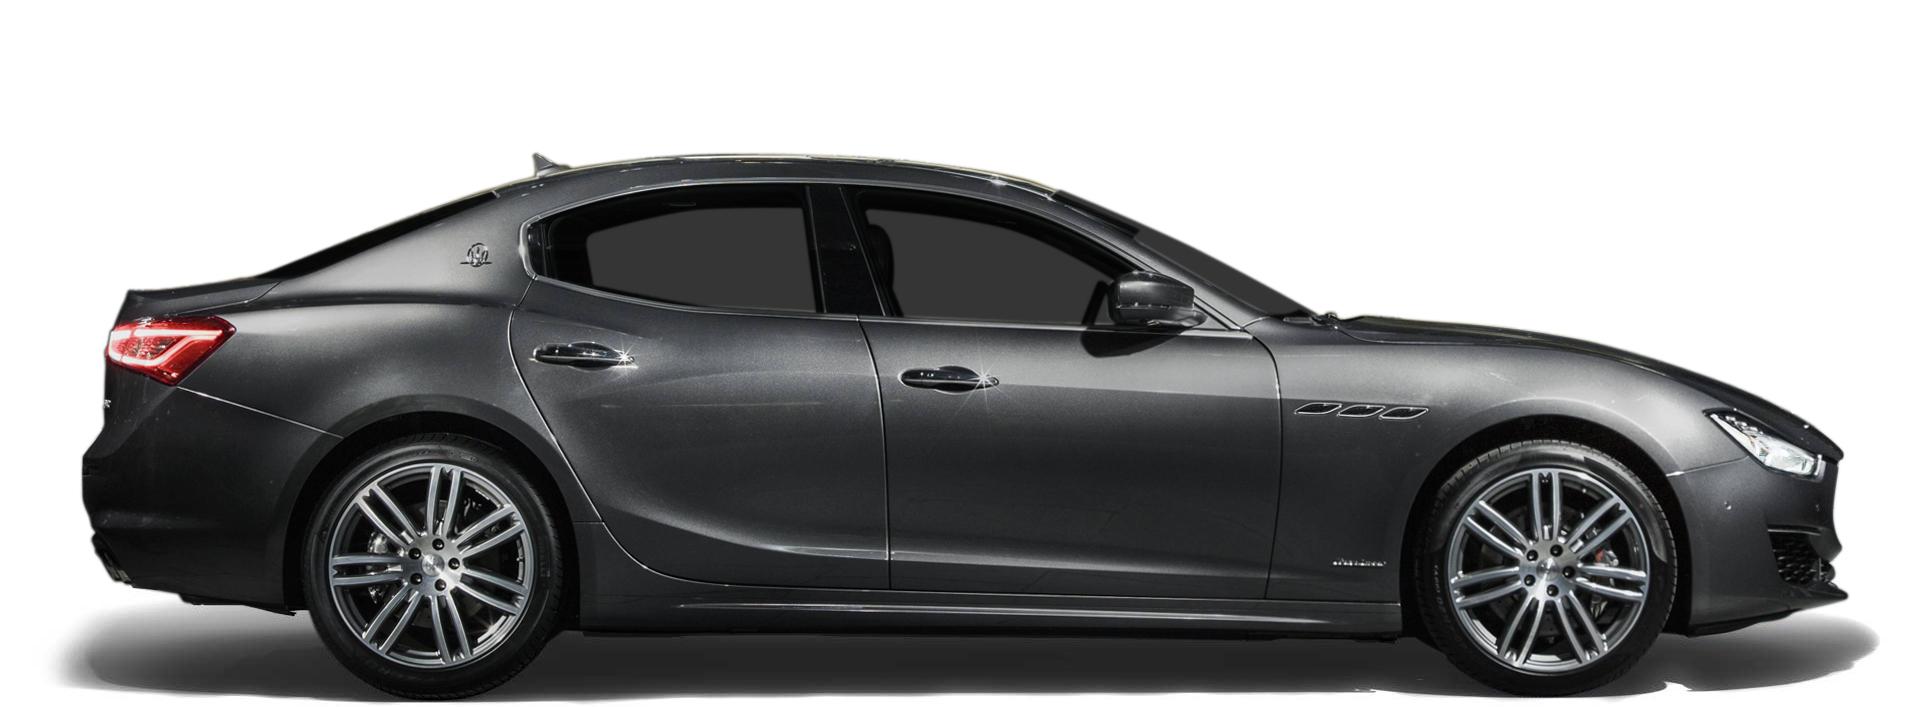 Maserati-Ghibli-GranLusso-MY18-side-hero.png